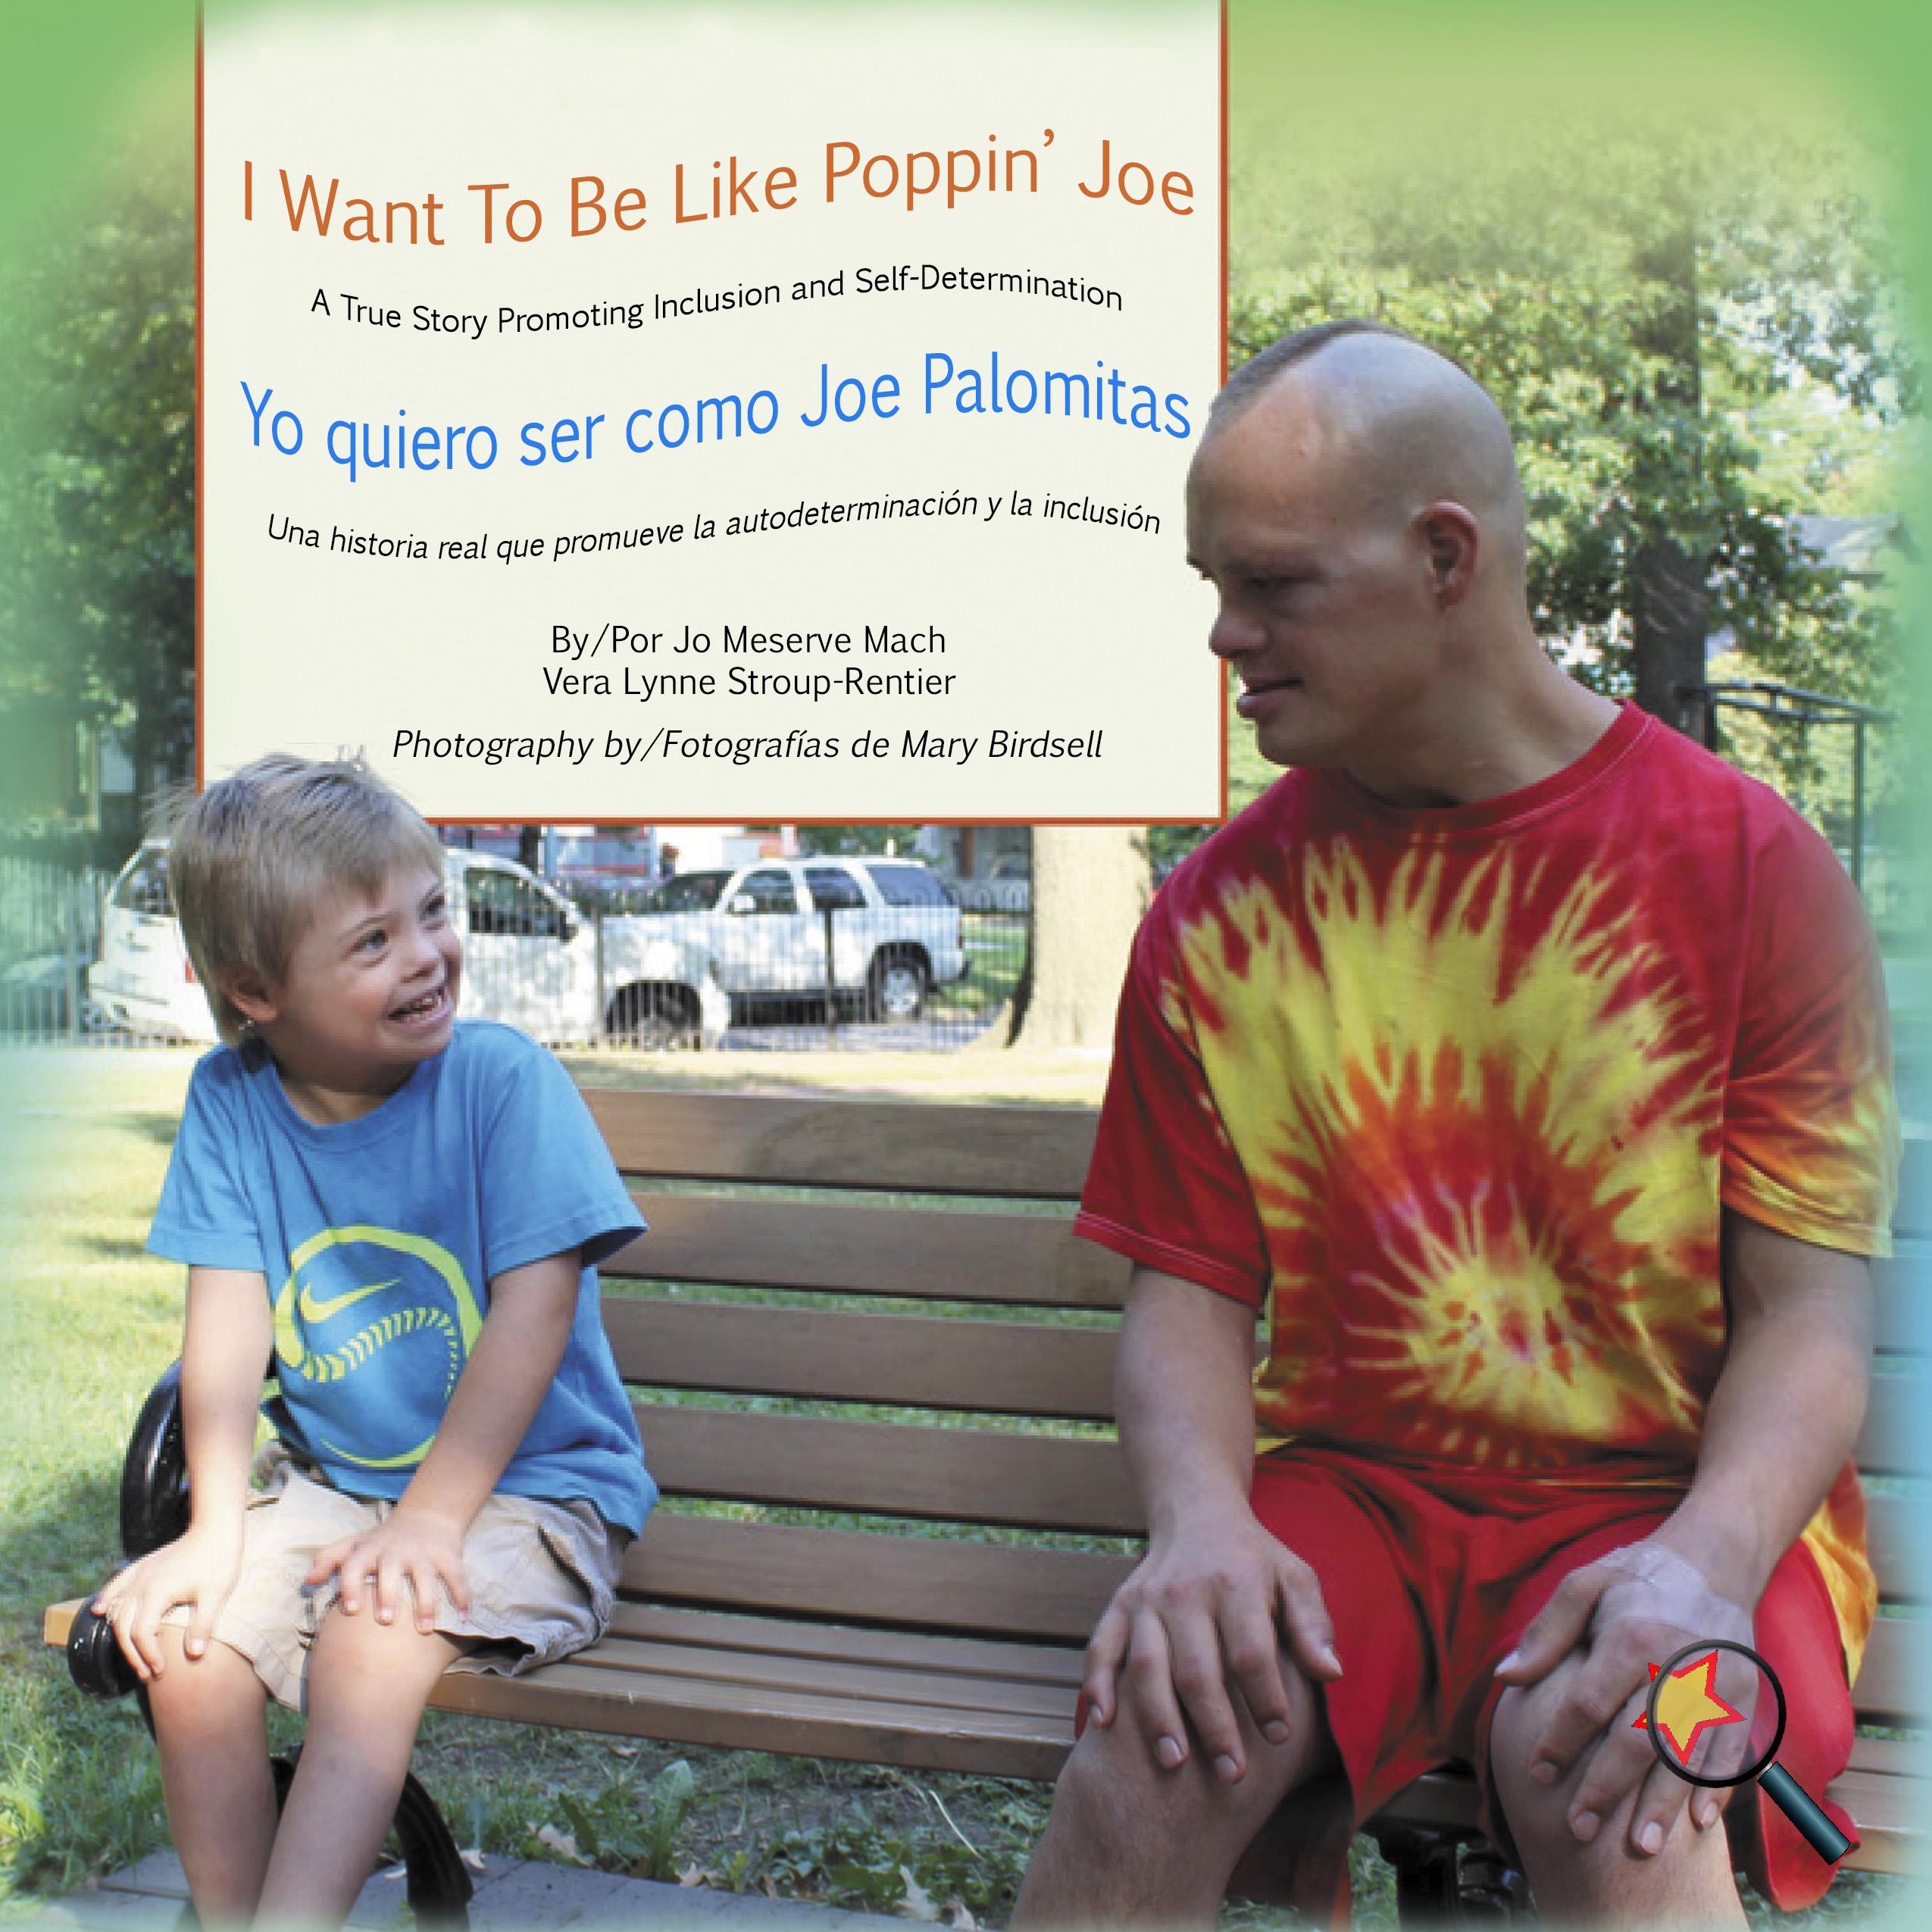 I Want To Be Like Poppin' Joe/Yo quiero ser como Joe Palomitas